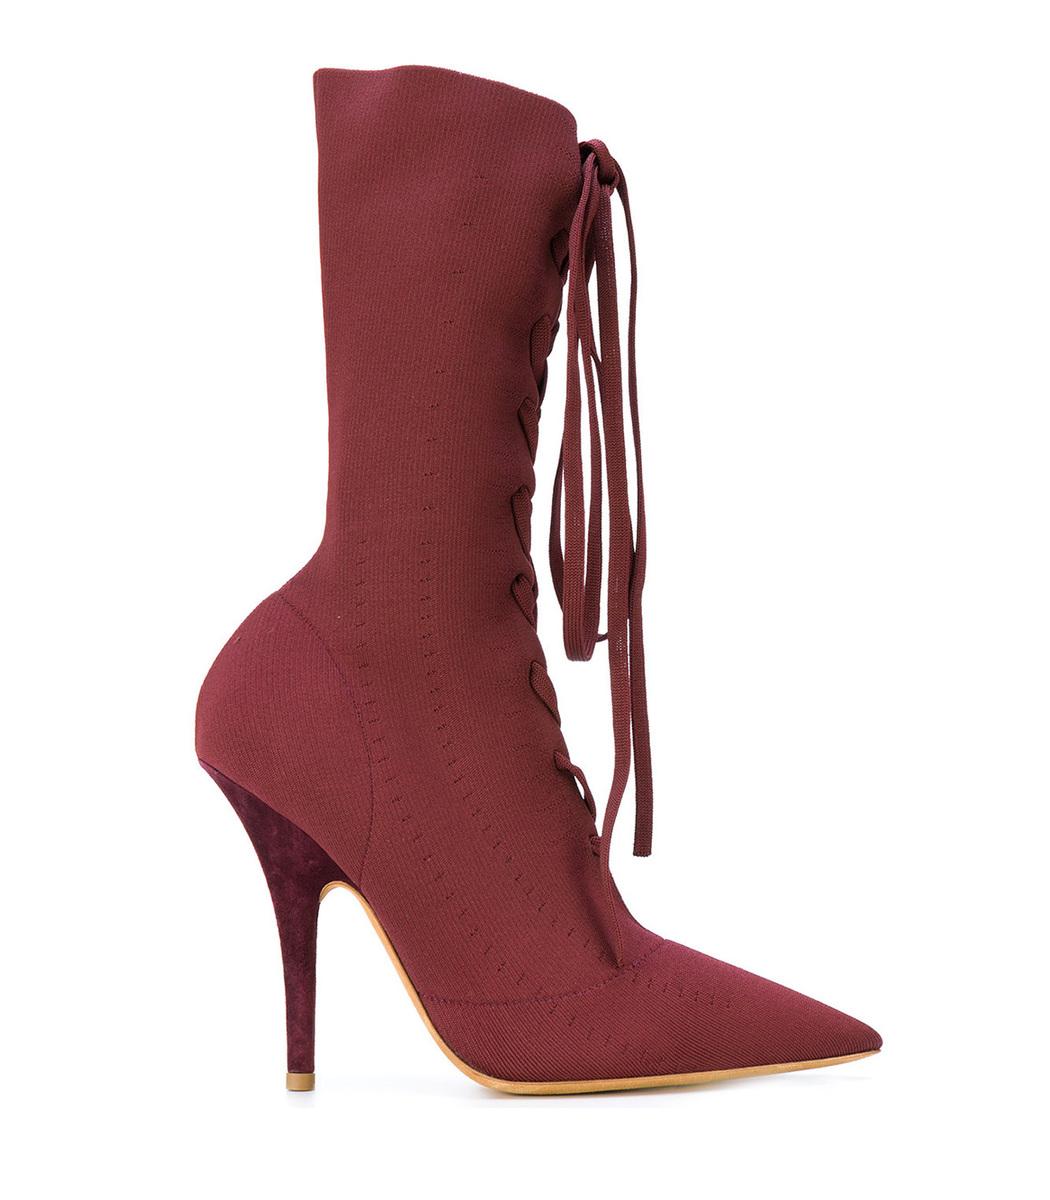 YEEZY Burgundy Knit Sock Boots TSbQK1